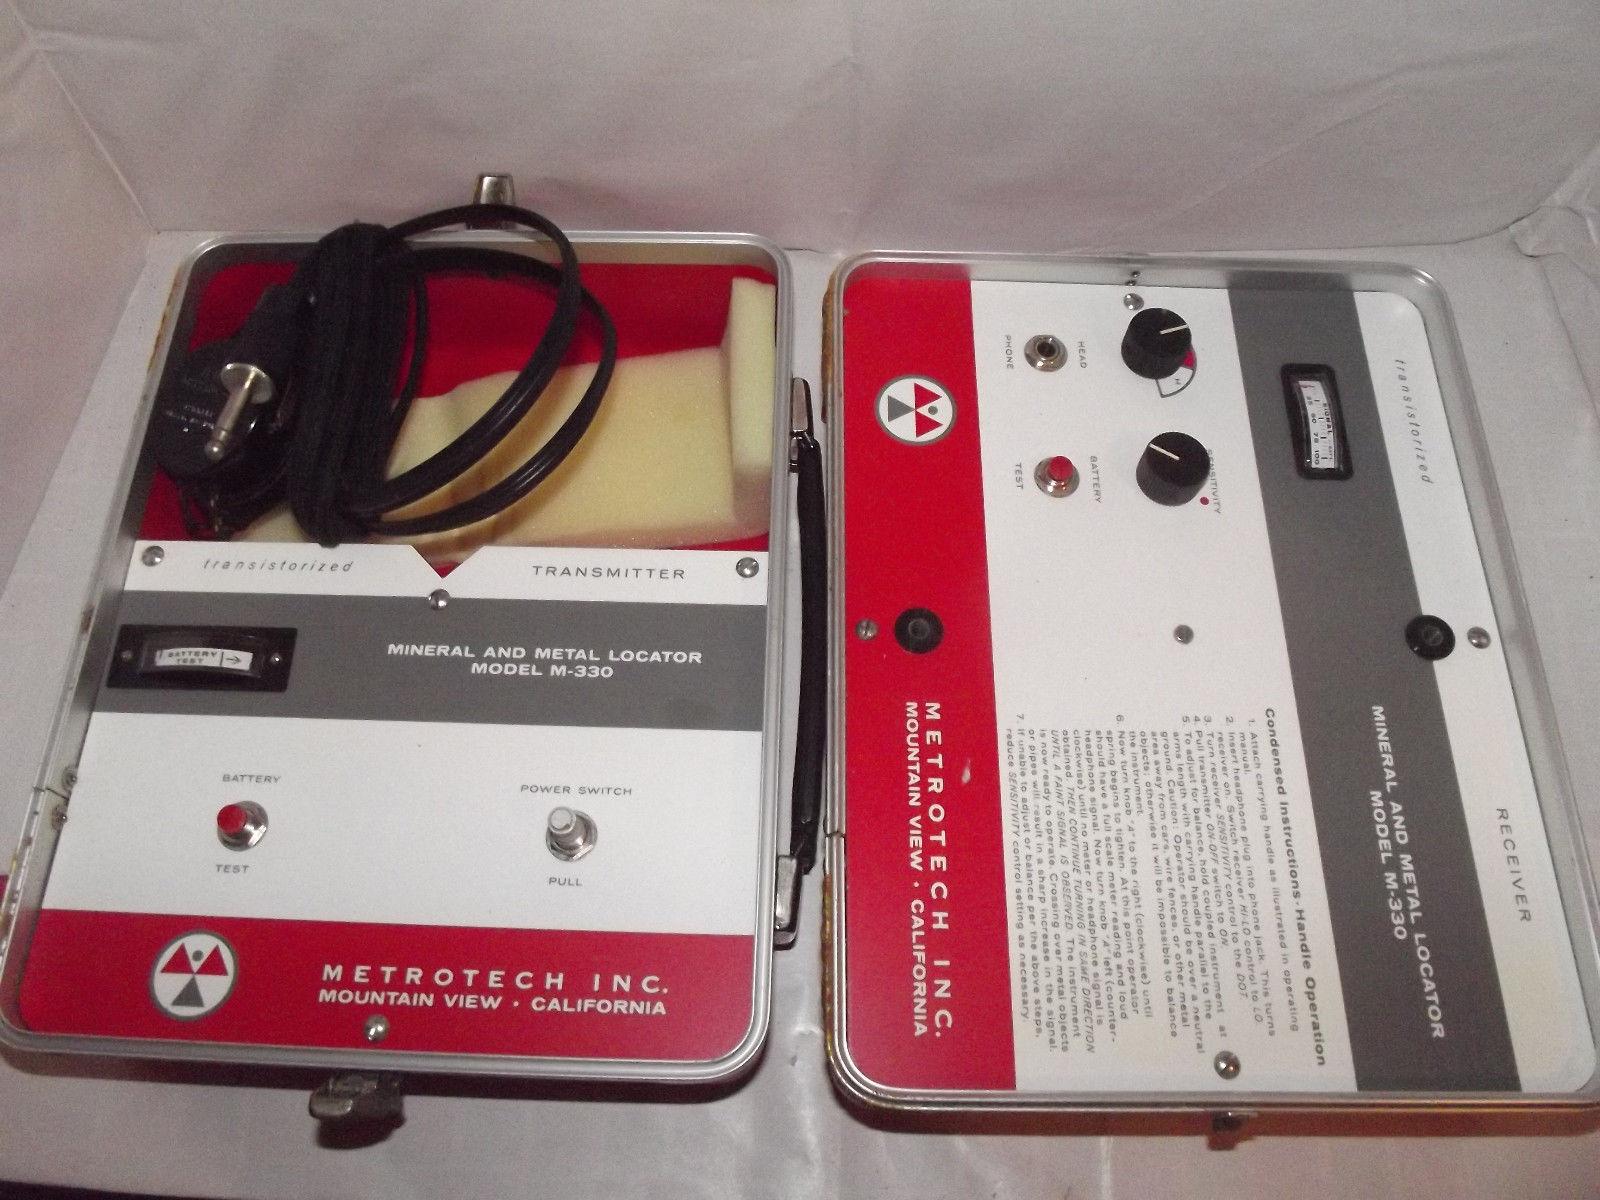 GOLDAK METAL DETECTORS,  aun se fabrican como el usado por vicente contreras 2cd198a22e8fe7e1e083877c3988b37ao